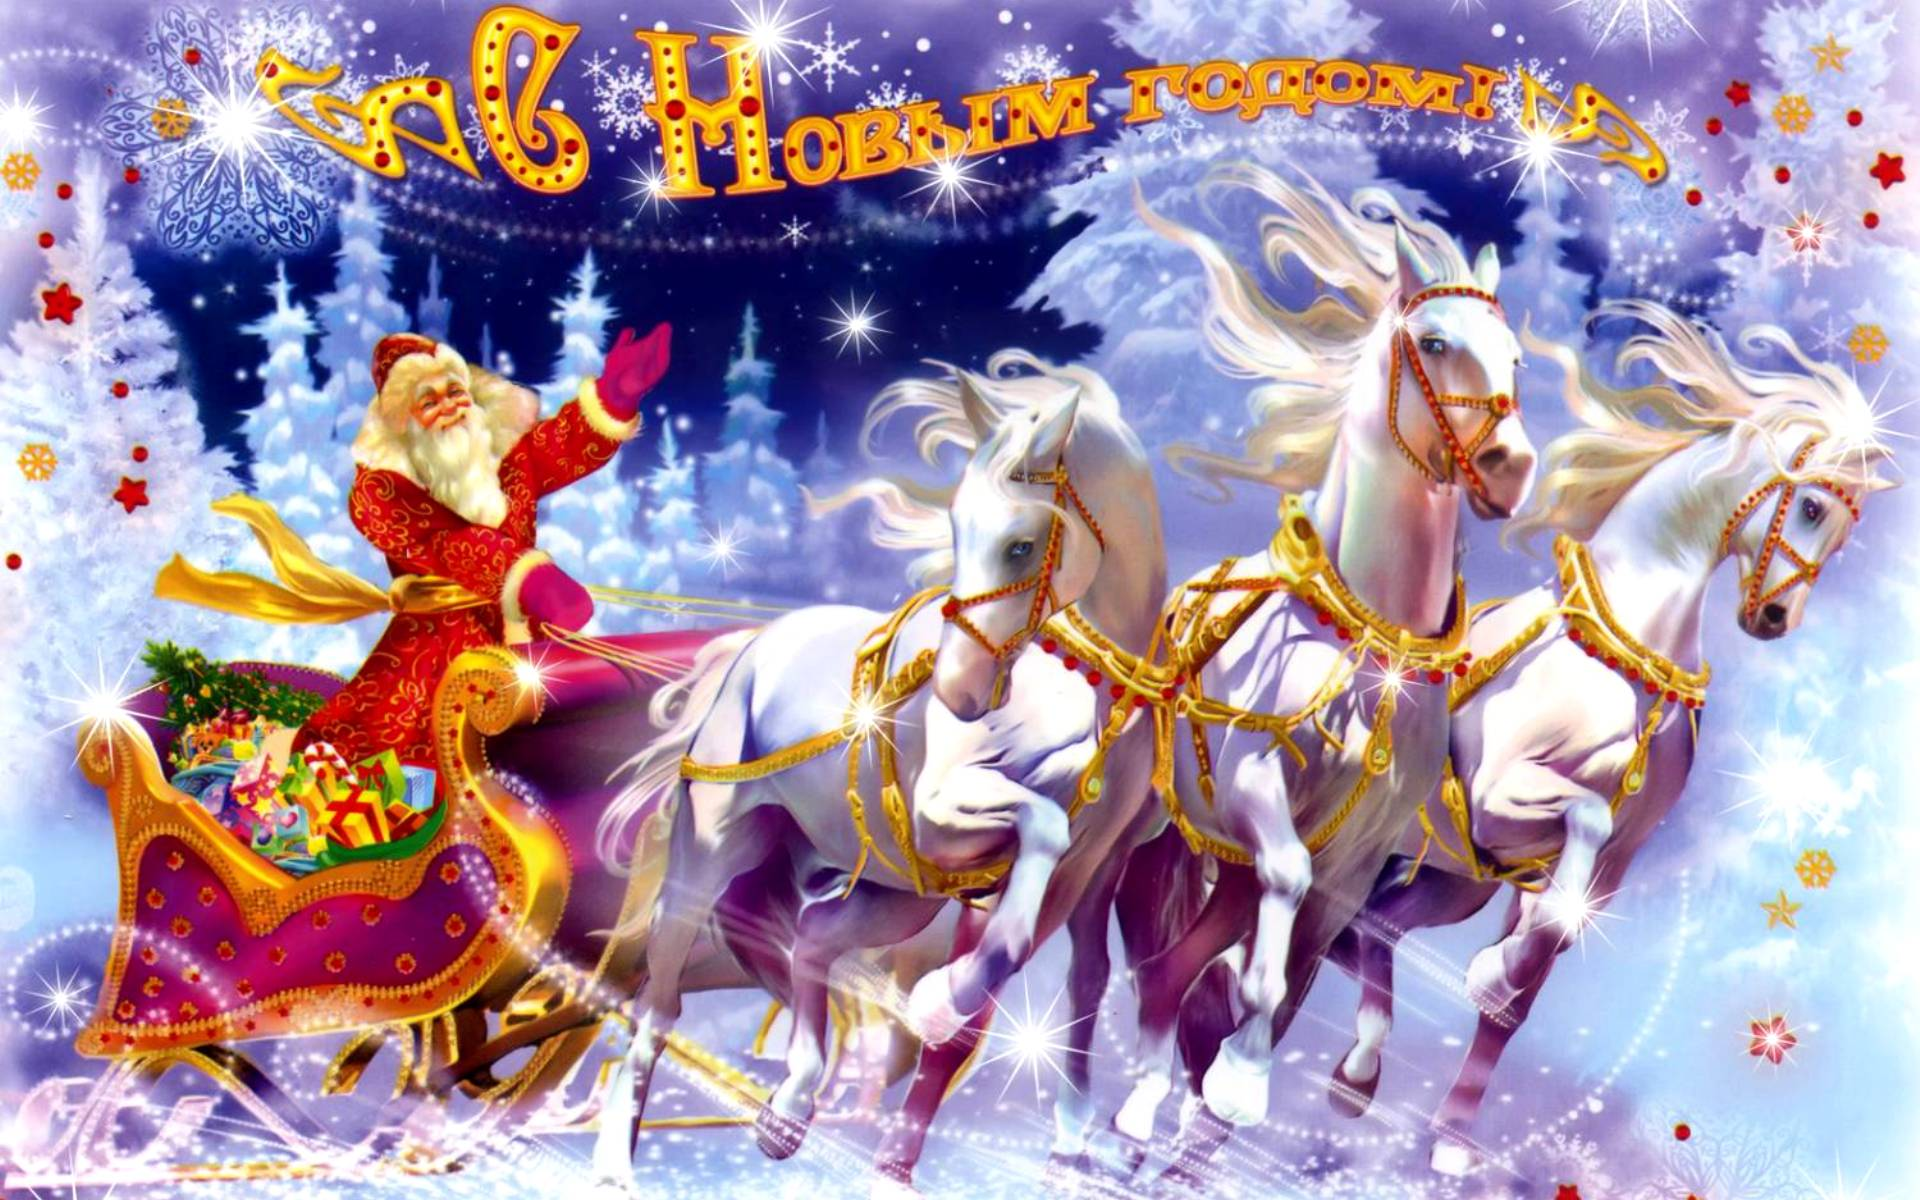 Дед мороз с подарками на открытках